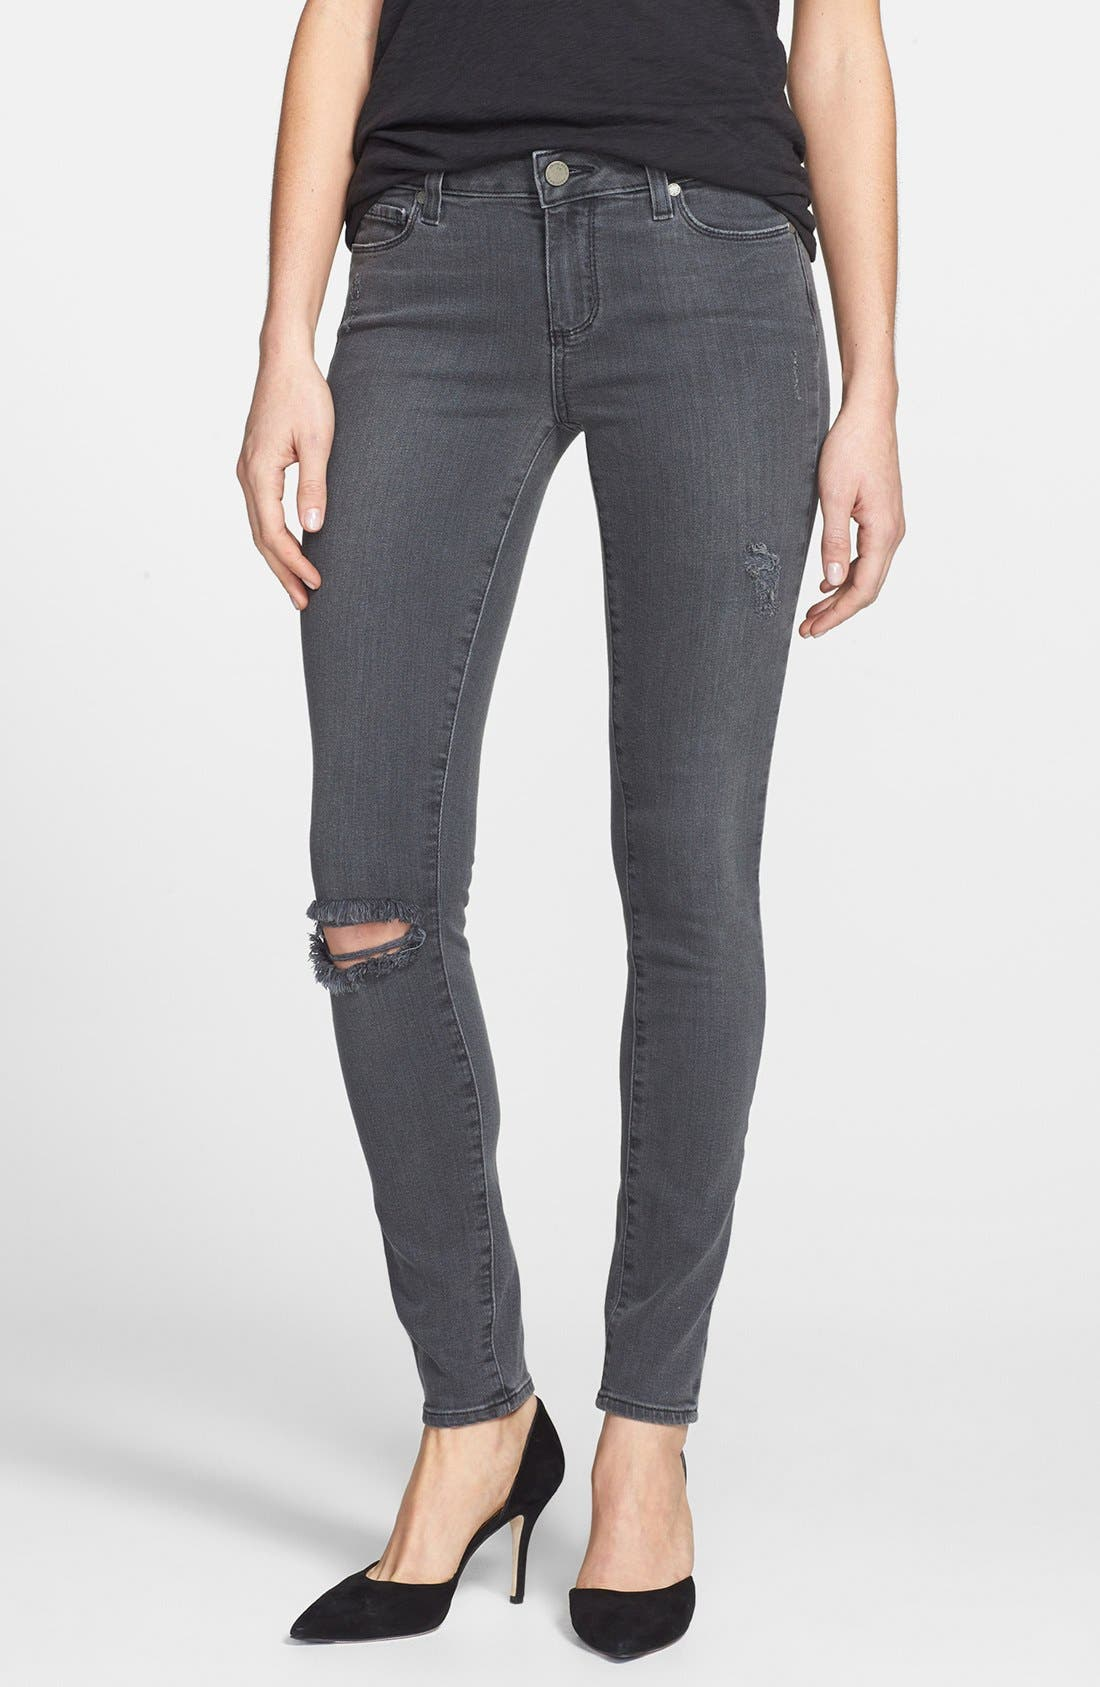 Main Image - Paige Denim 'Verdugo' Distressed Ultra Skinny Jeans (Kate Destructive)